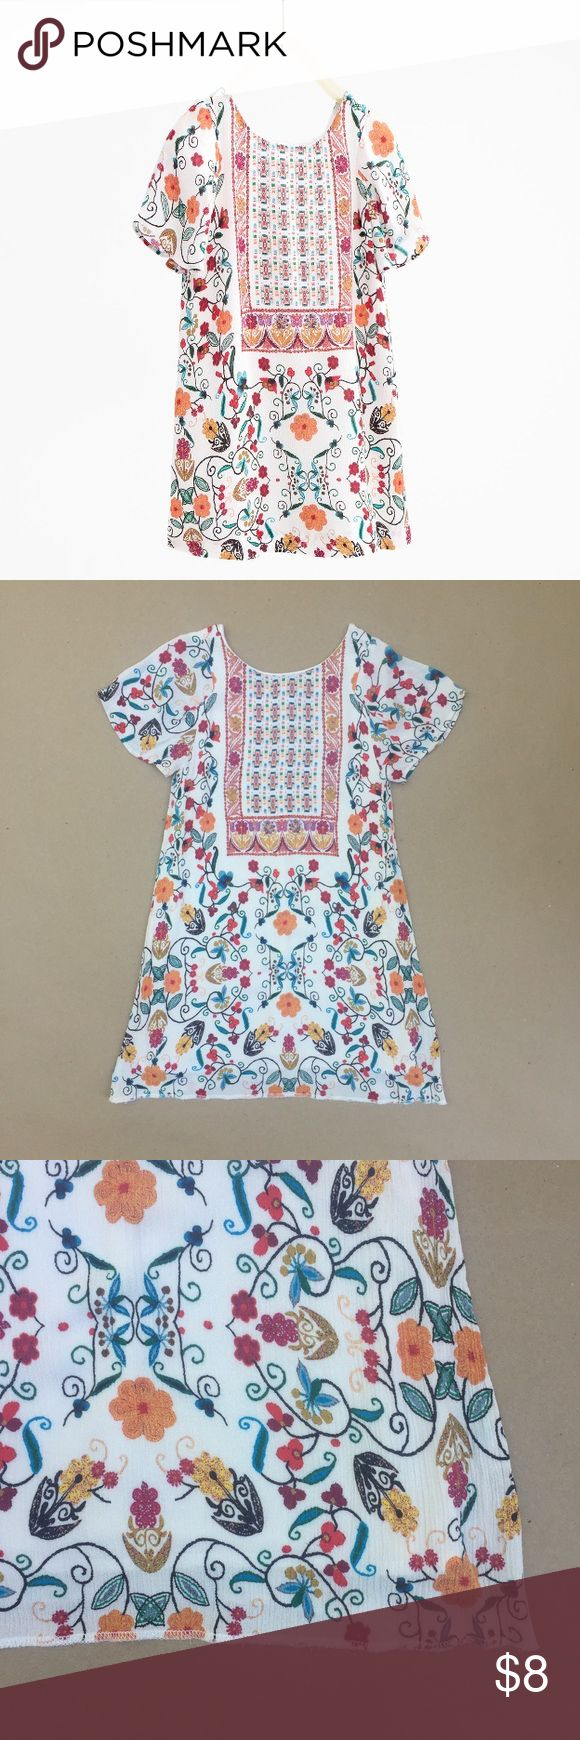 Zara girls dress Lightweight fabric, printed dress. Lined. Runs small, more like 5/6. Hem was dropped to make the length longer. Zara Dresses Casual